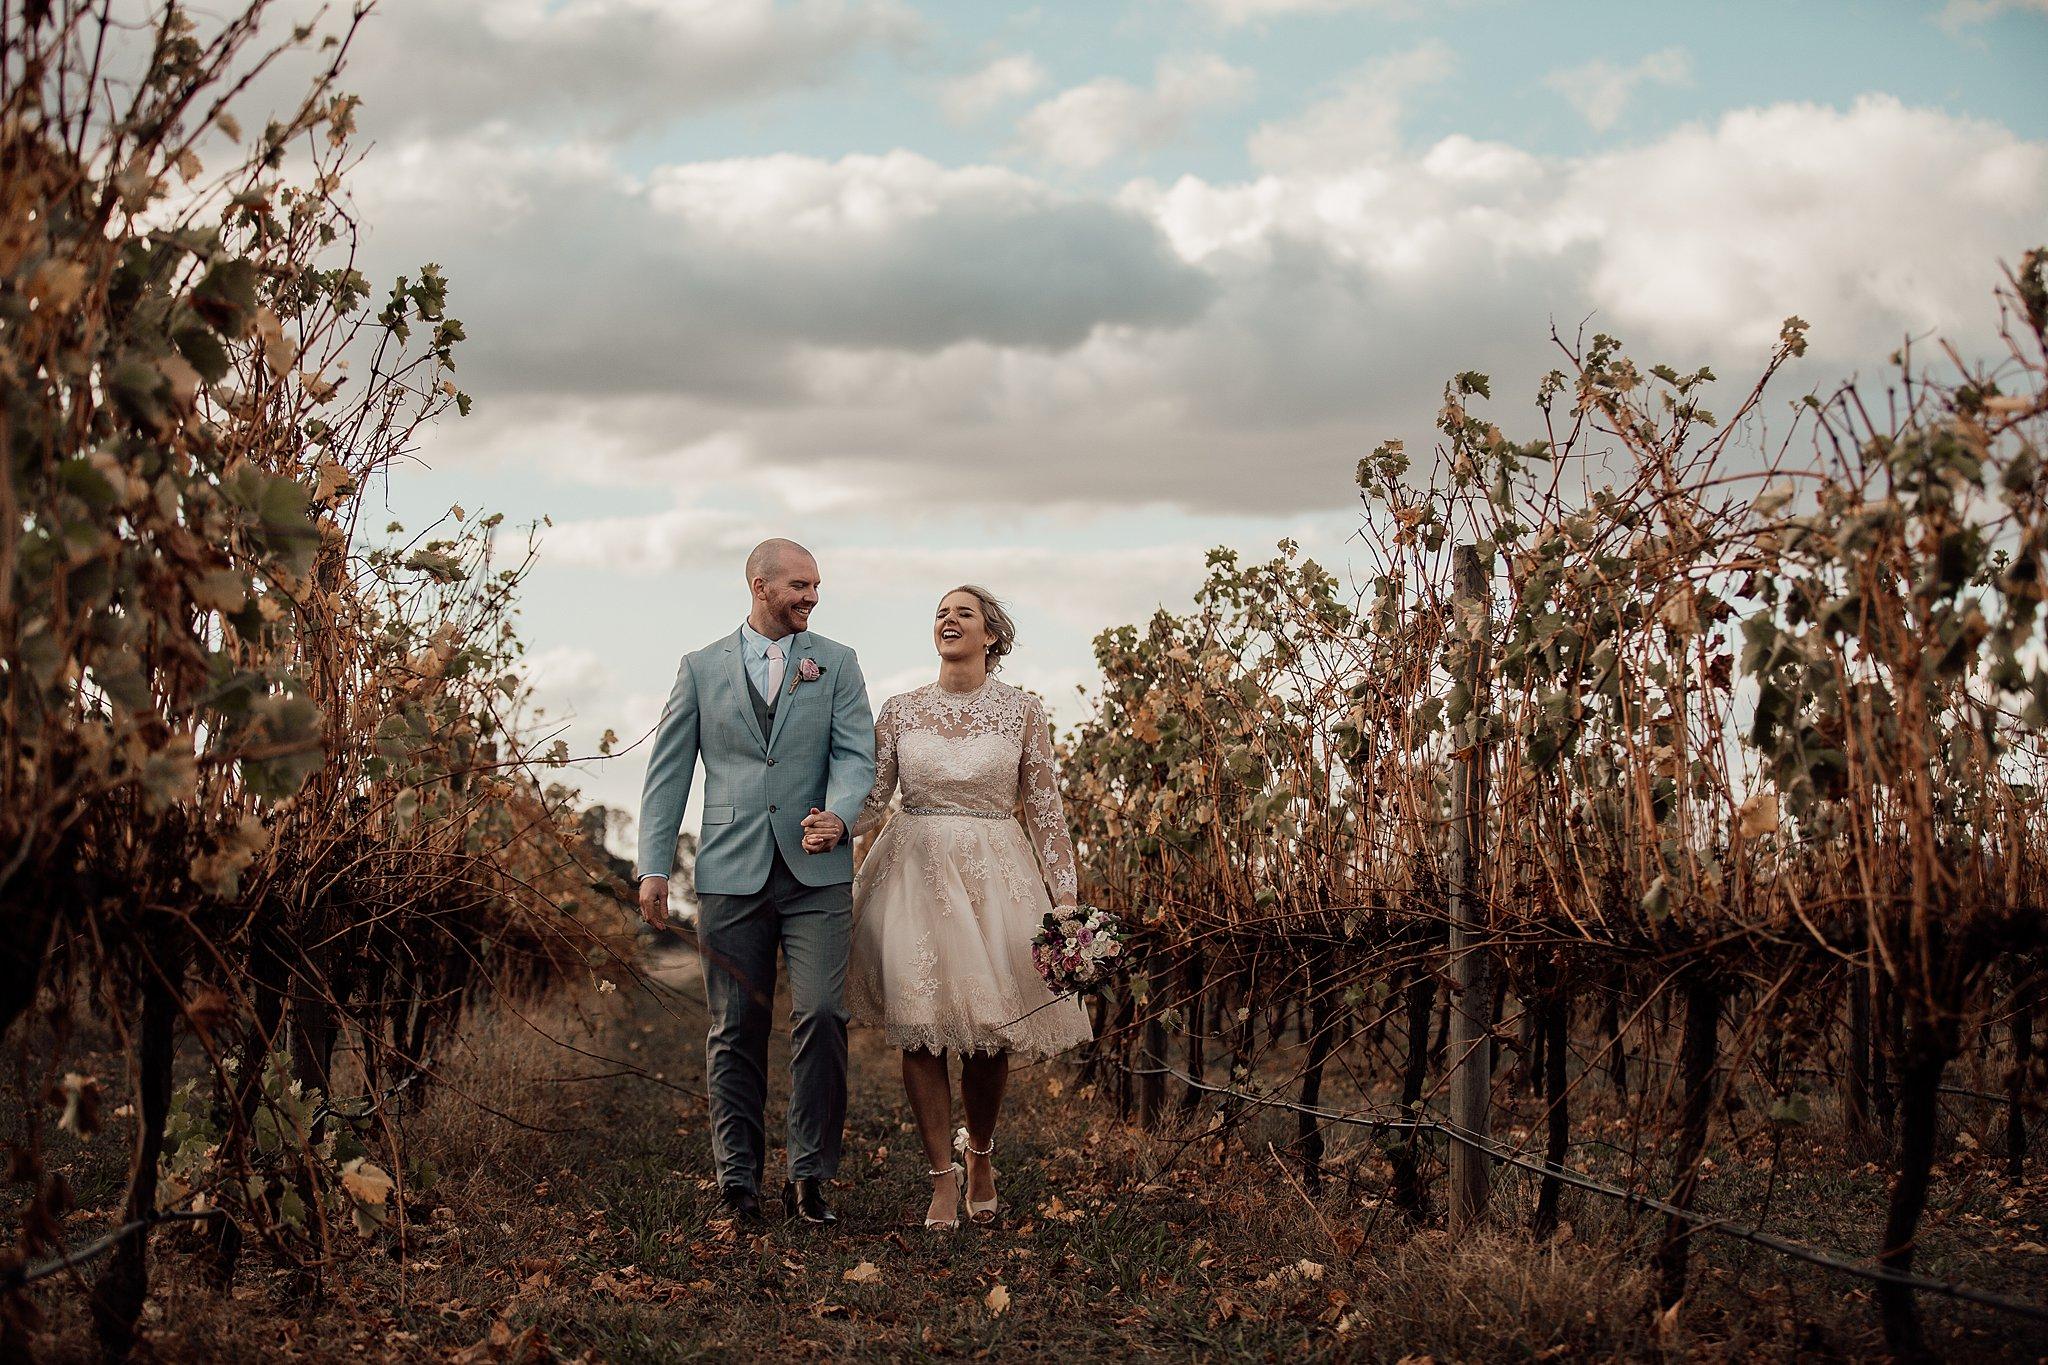 mickalathomas_puremacphotography_weddingphotographer_couplephotographer_Sheppartonphotographer_3455.jpg